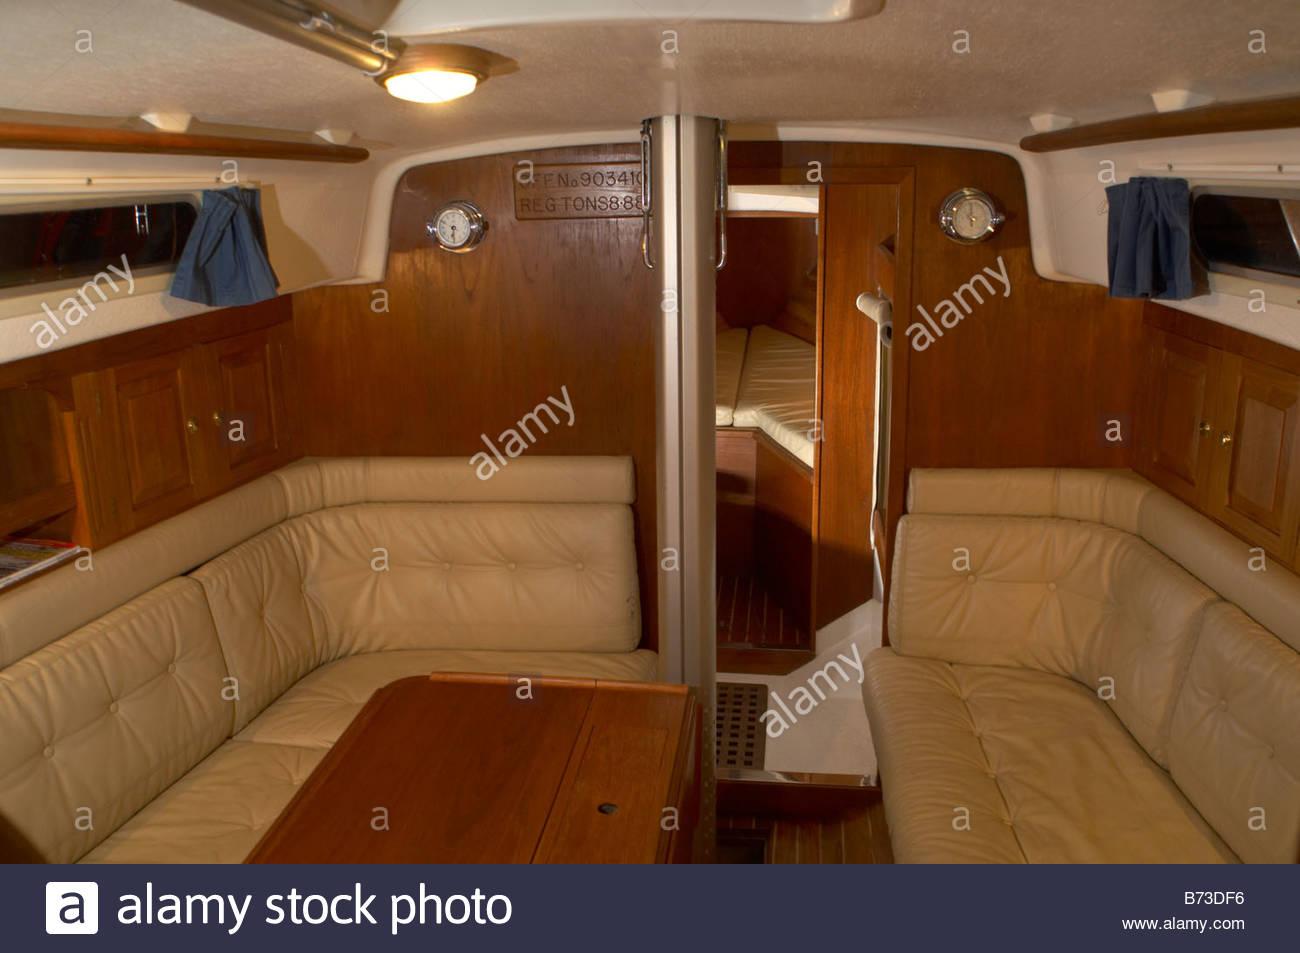 The Interior Of A Contessa 32 Sailing Yacht The Saloon Stock Photo